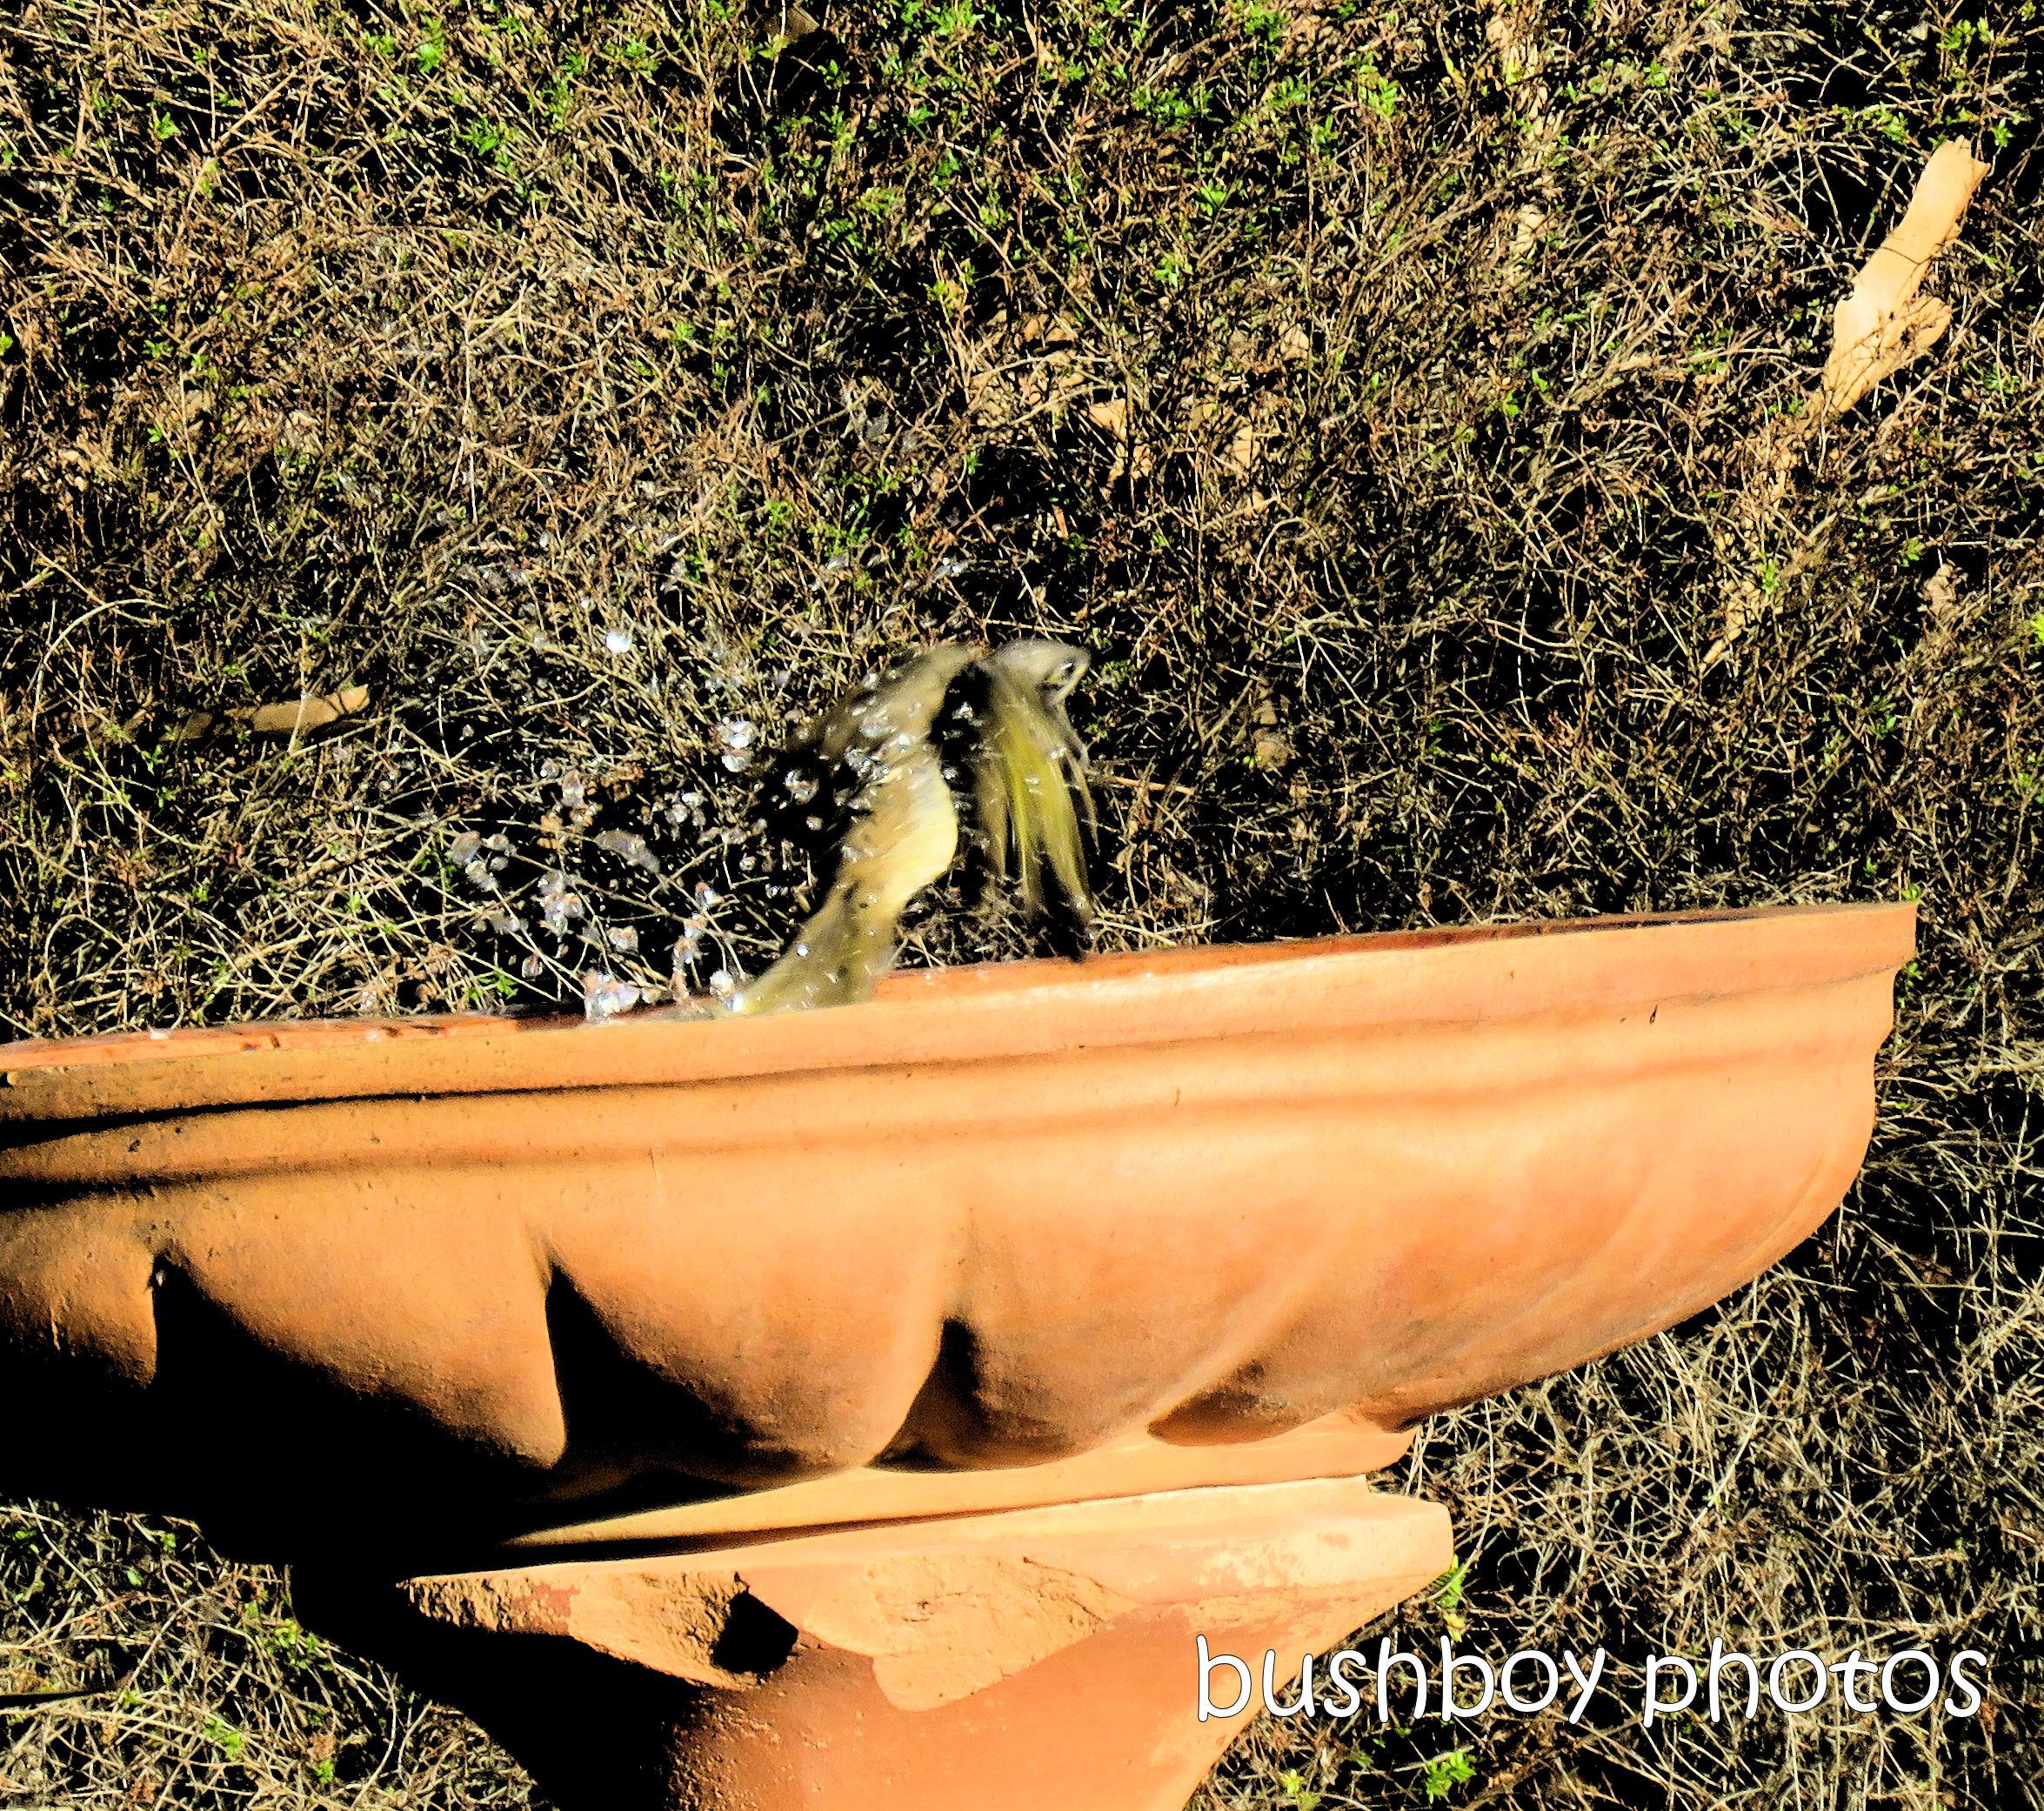 190224_blog_challenge_movement_bird_bath_lewins_honeyeater